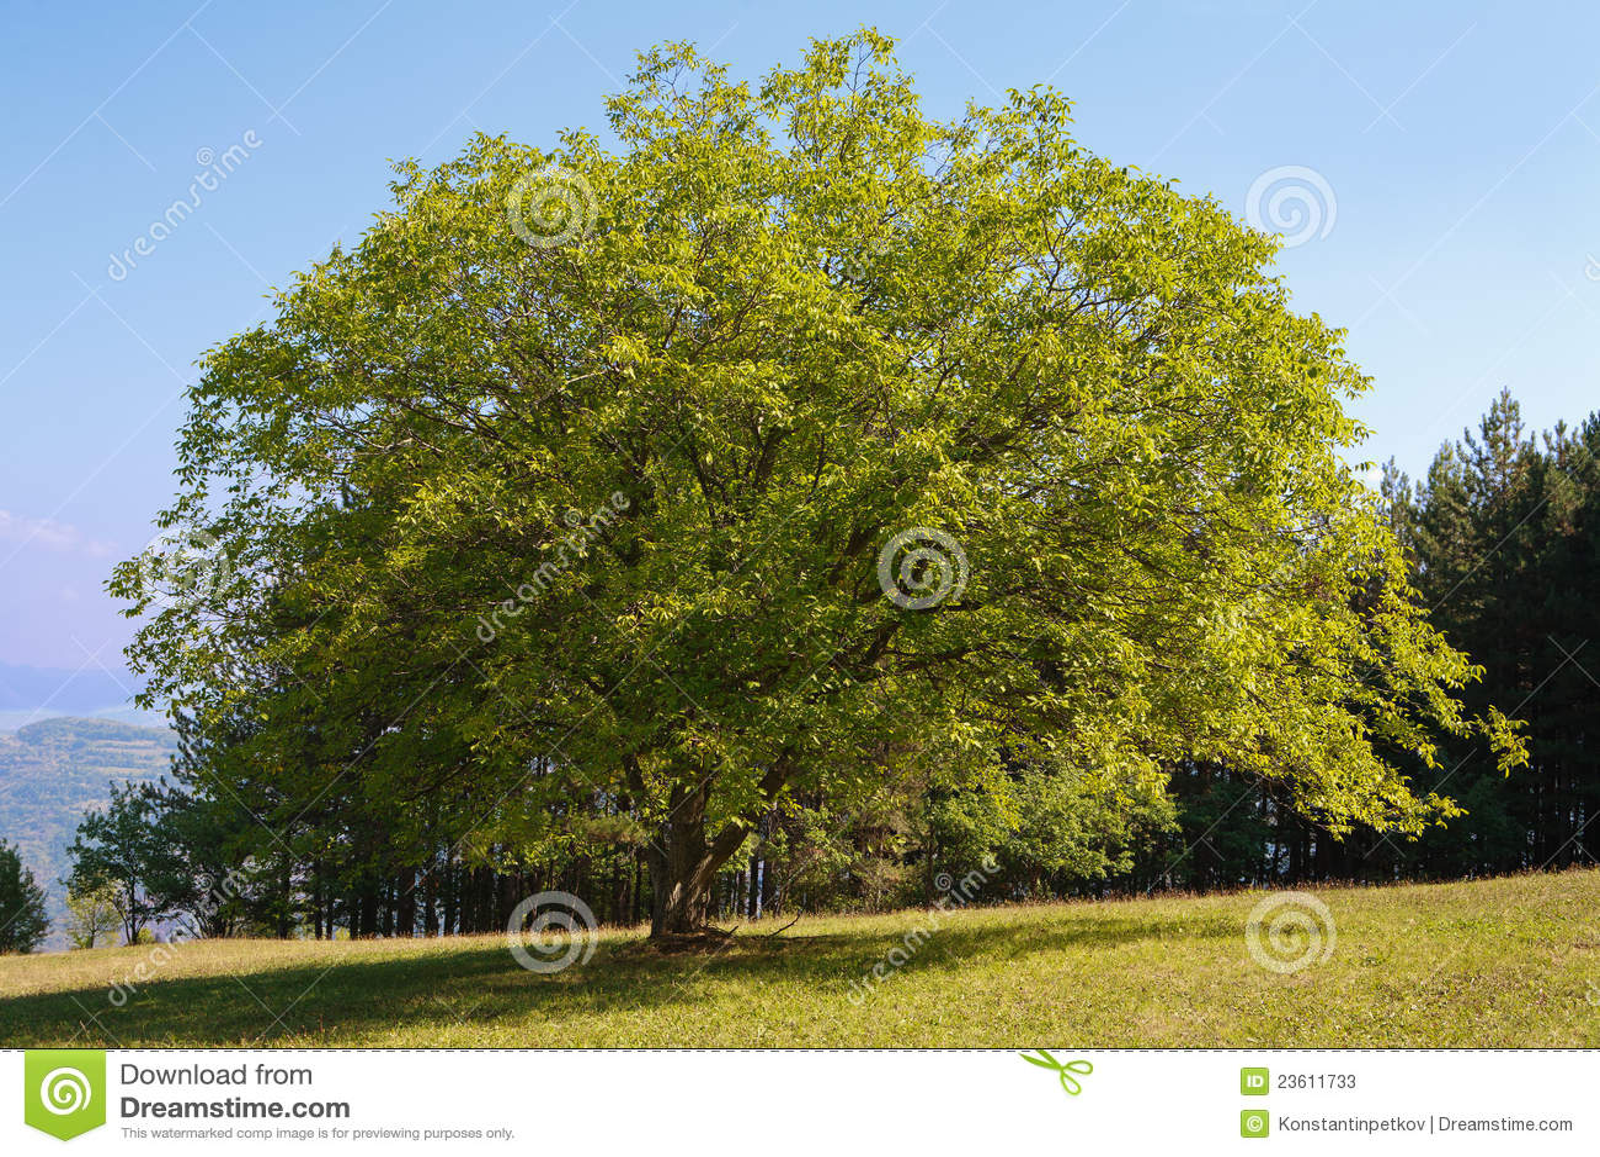 Walnut tree stock image  Image of blue, branch, lumber